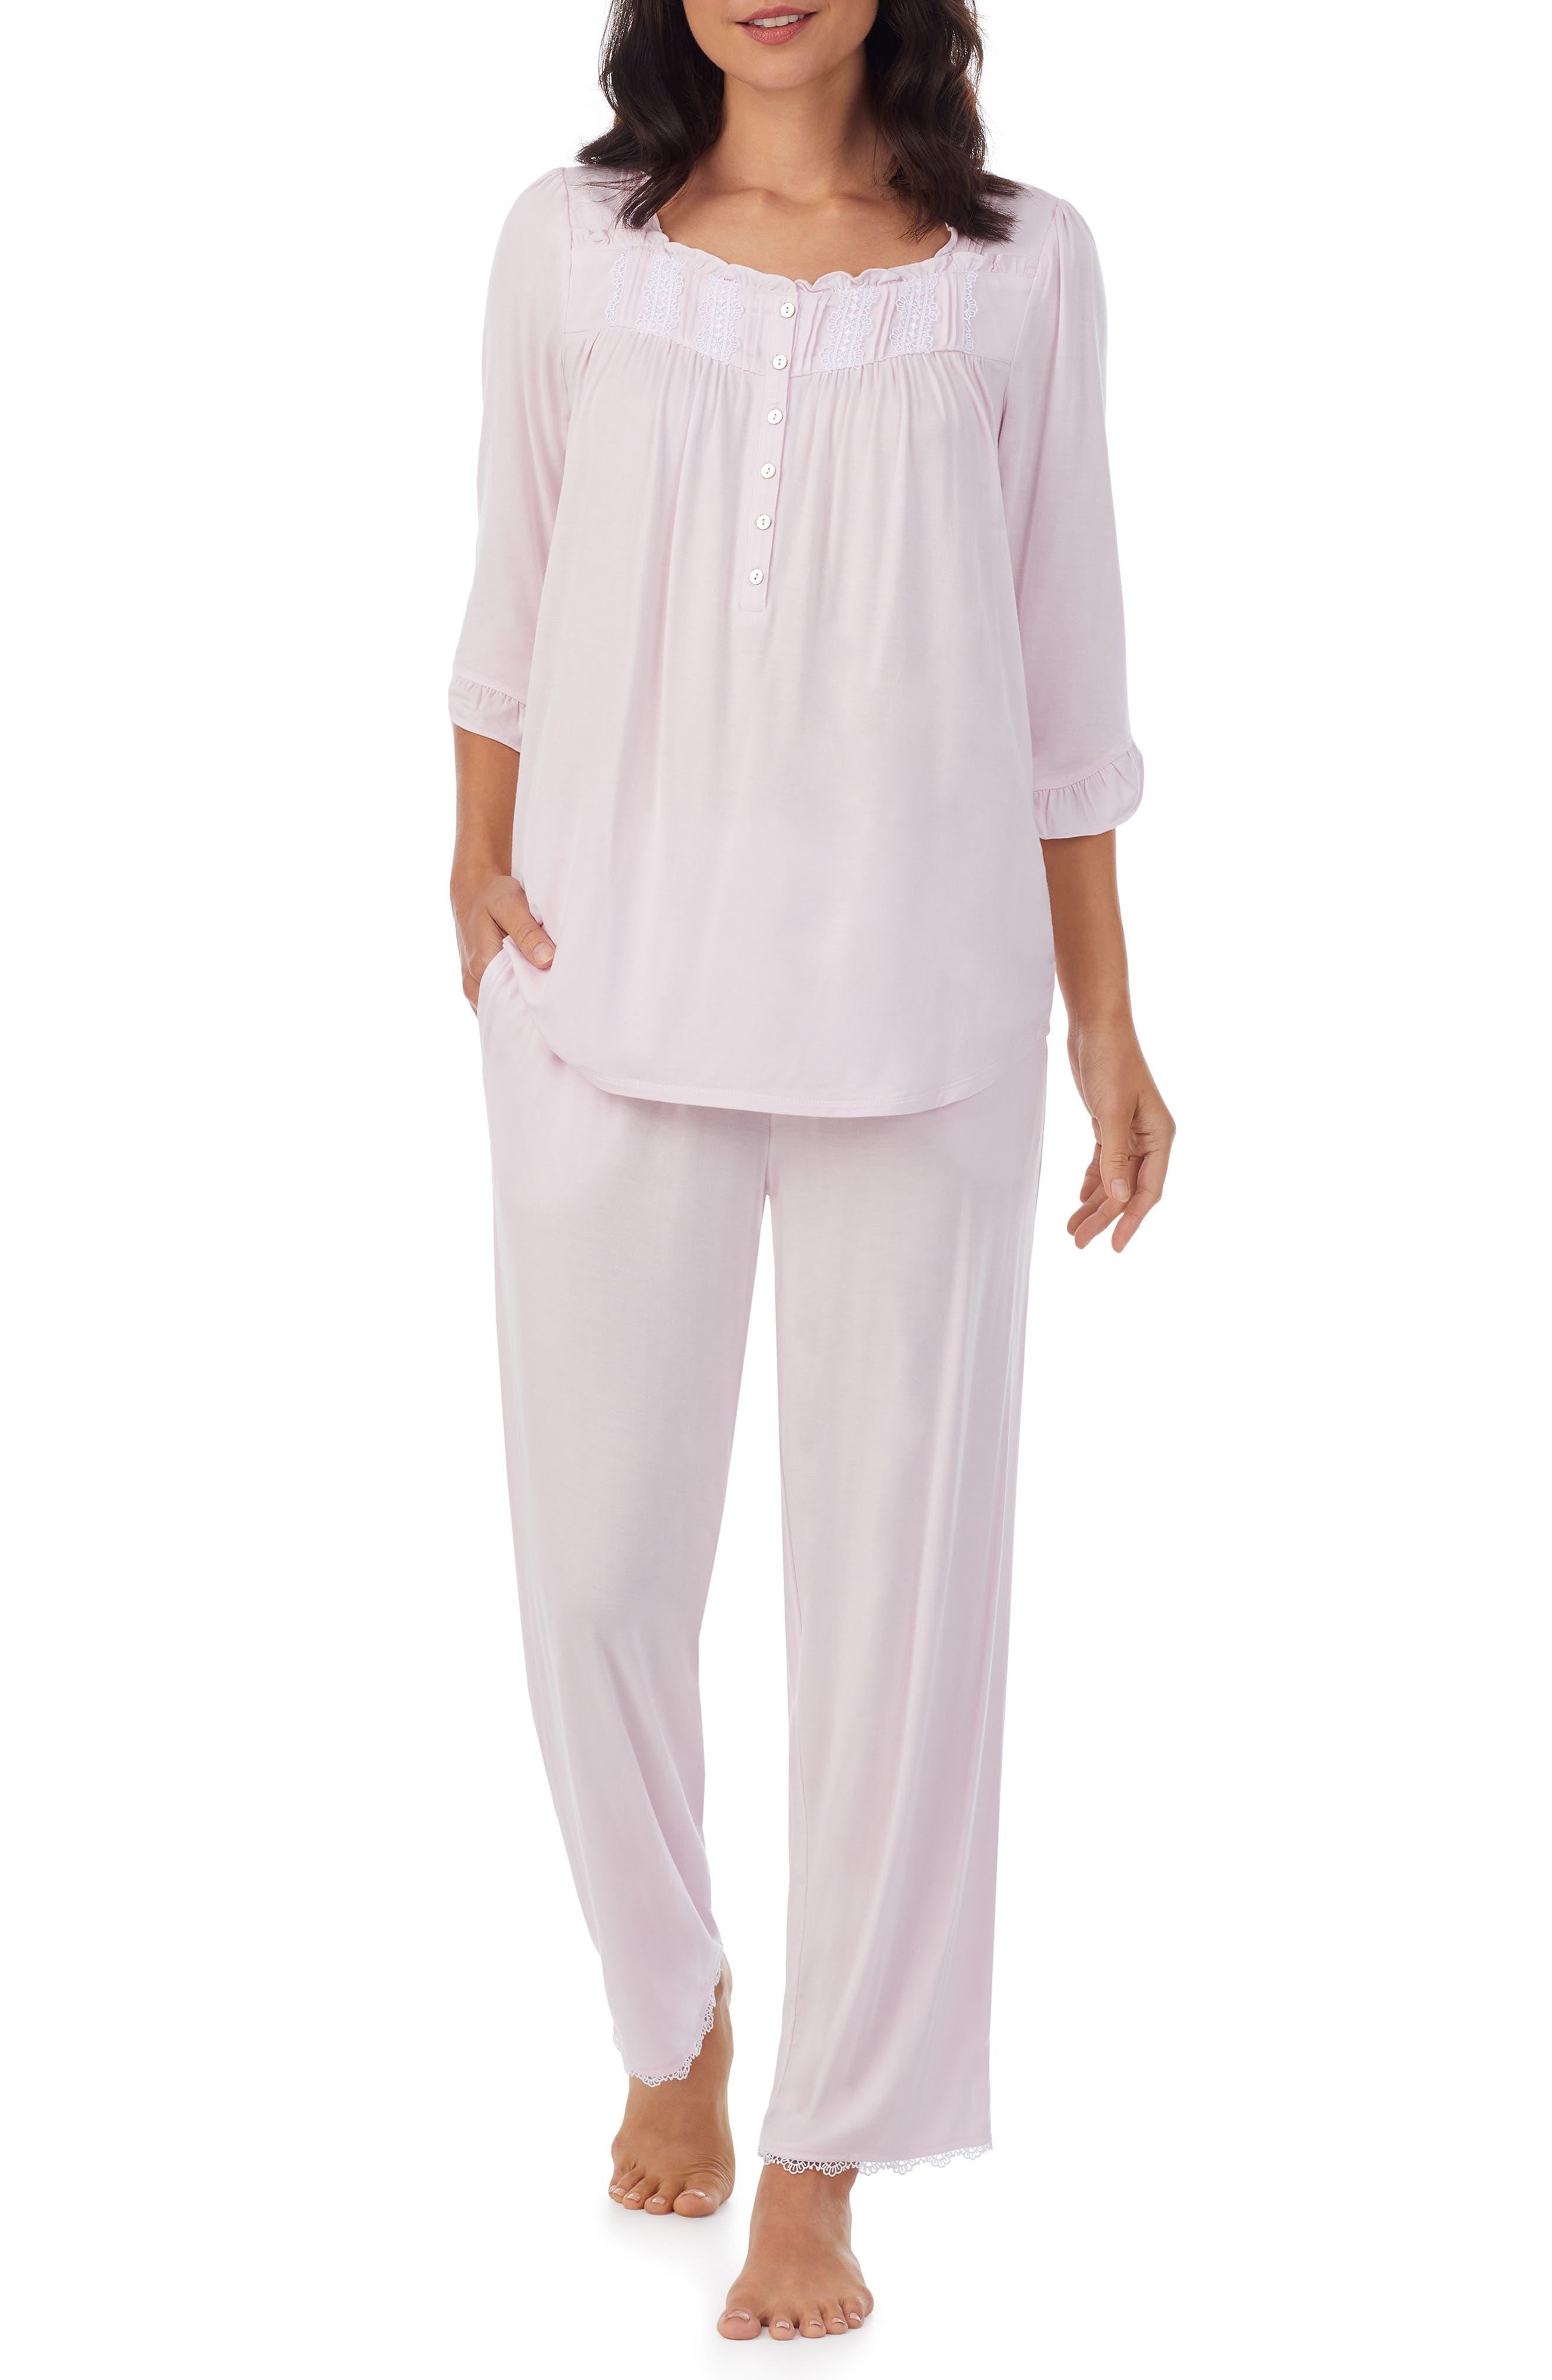 Women's Eileen Fisher Lace Trim Jersey Pajamas